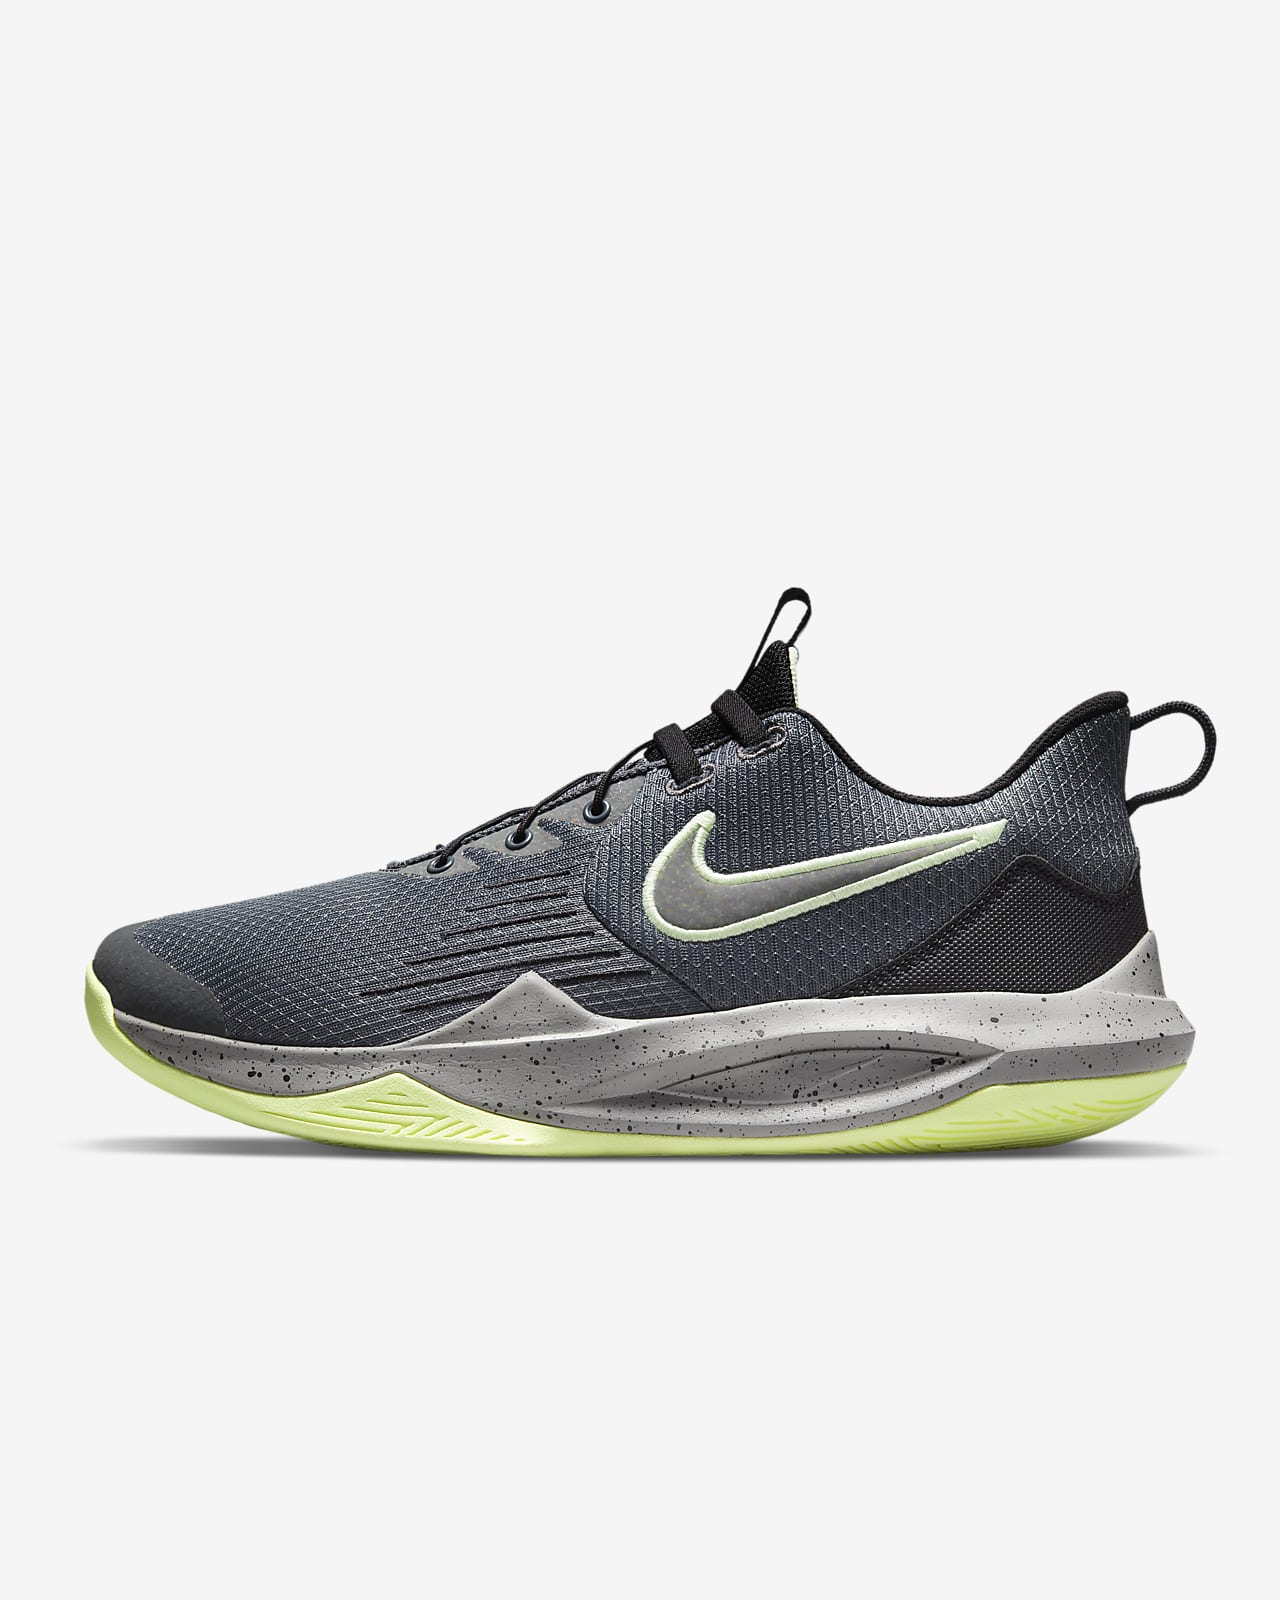 Nike Precision 5 FlyEase Basketball Shoes